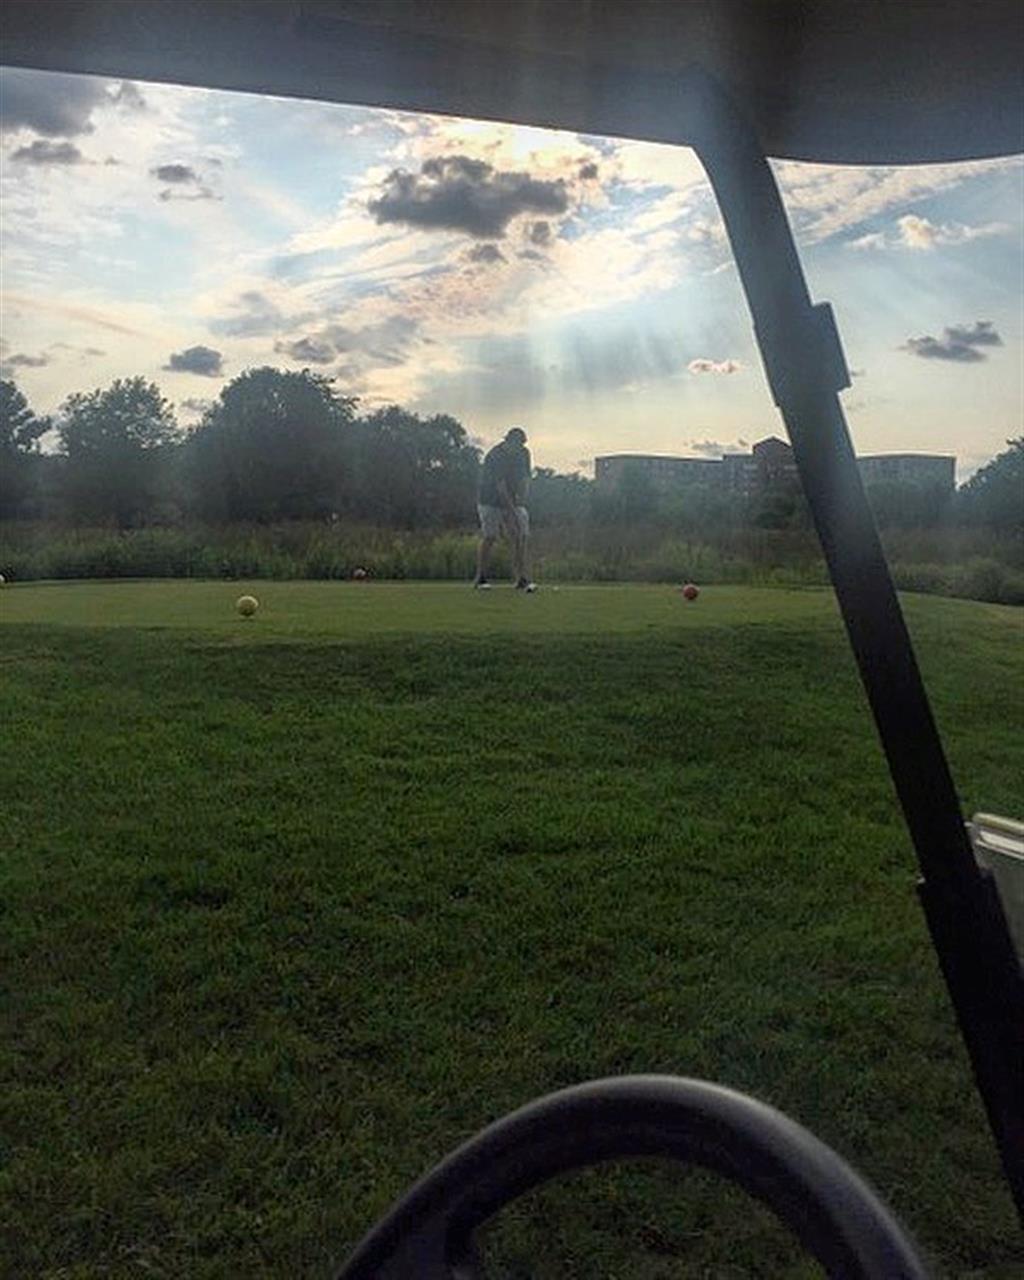 Lisle's hidden greens make for a great Sunday afternoon. #lisle #chicago #leadingrelocal #bairdwarner #golf #weekendwarrior